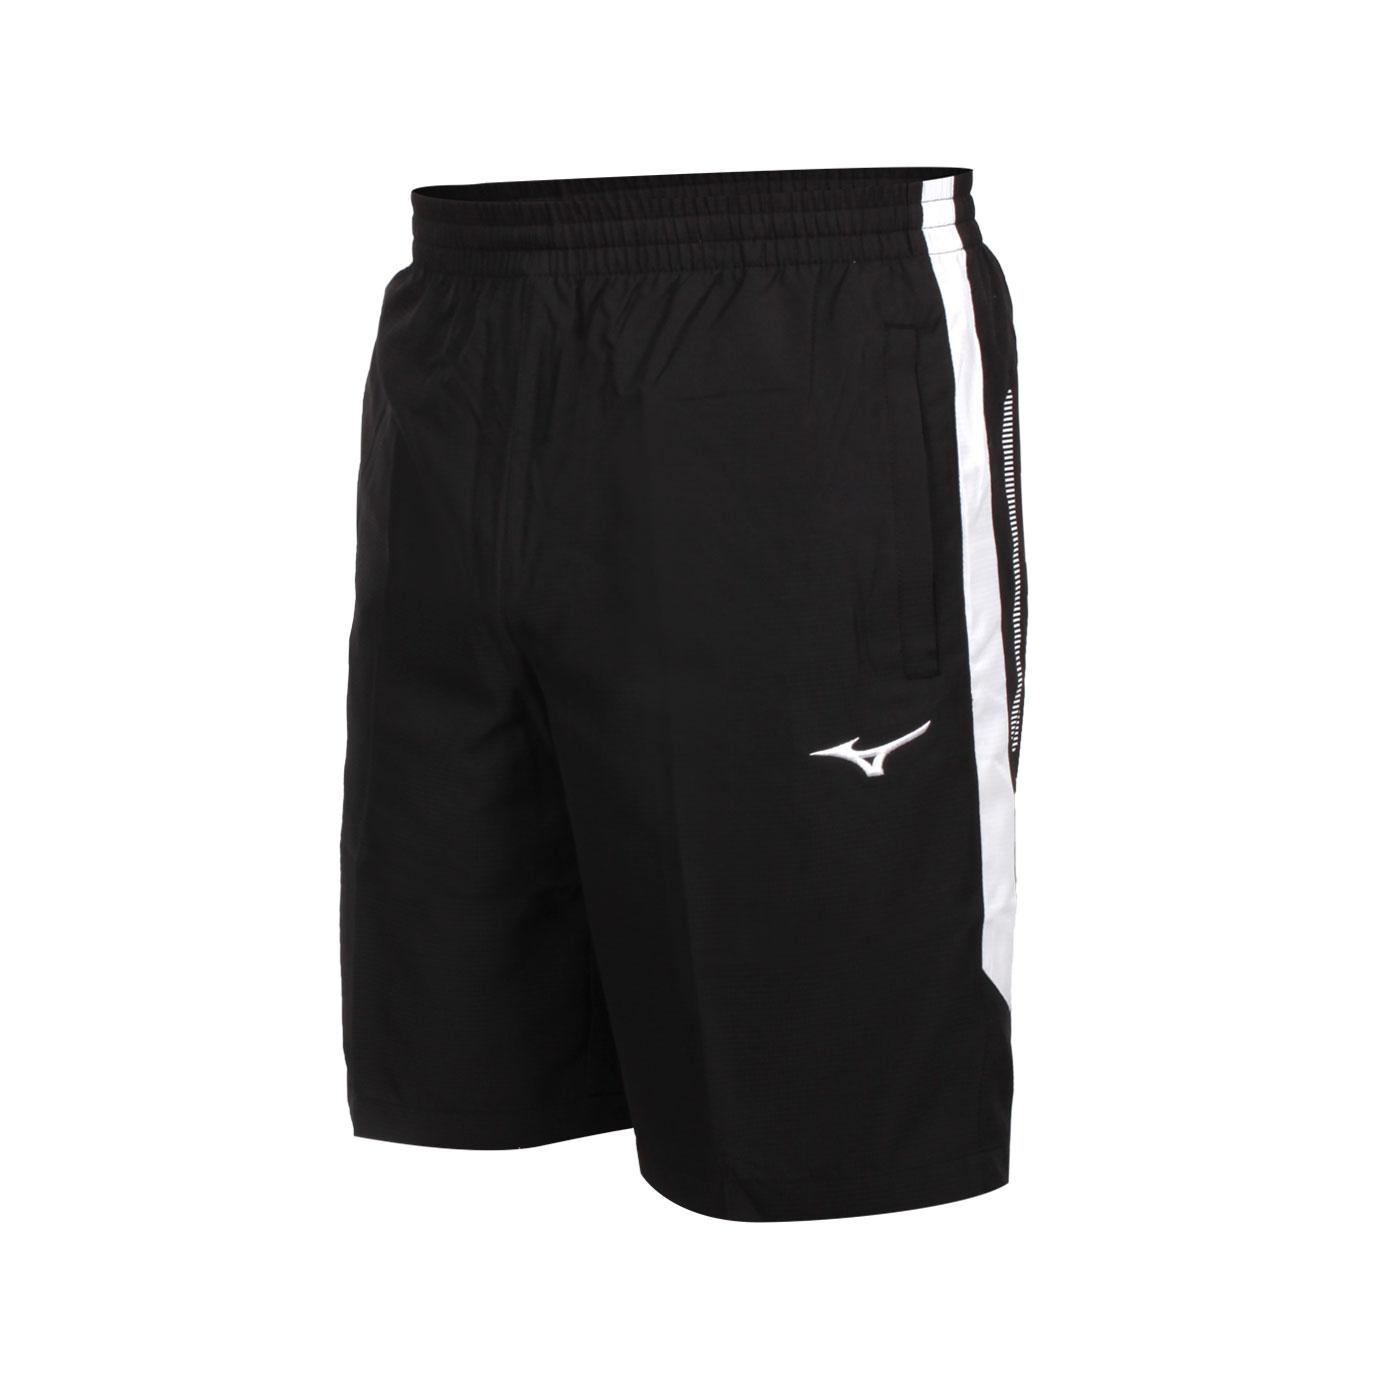 MIZUNO 男款平織運動短褲 32TB105290 - 黑白